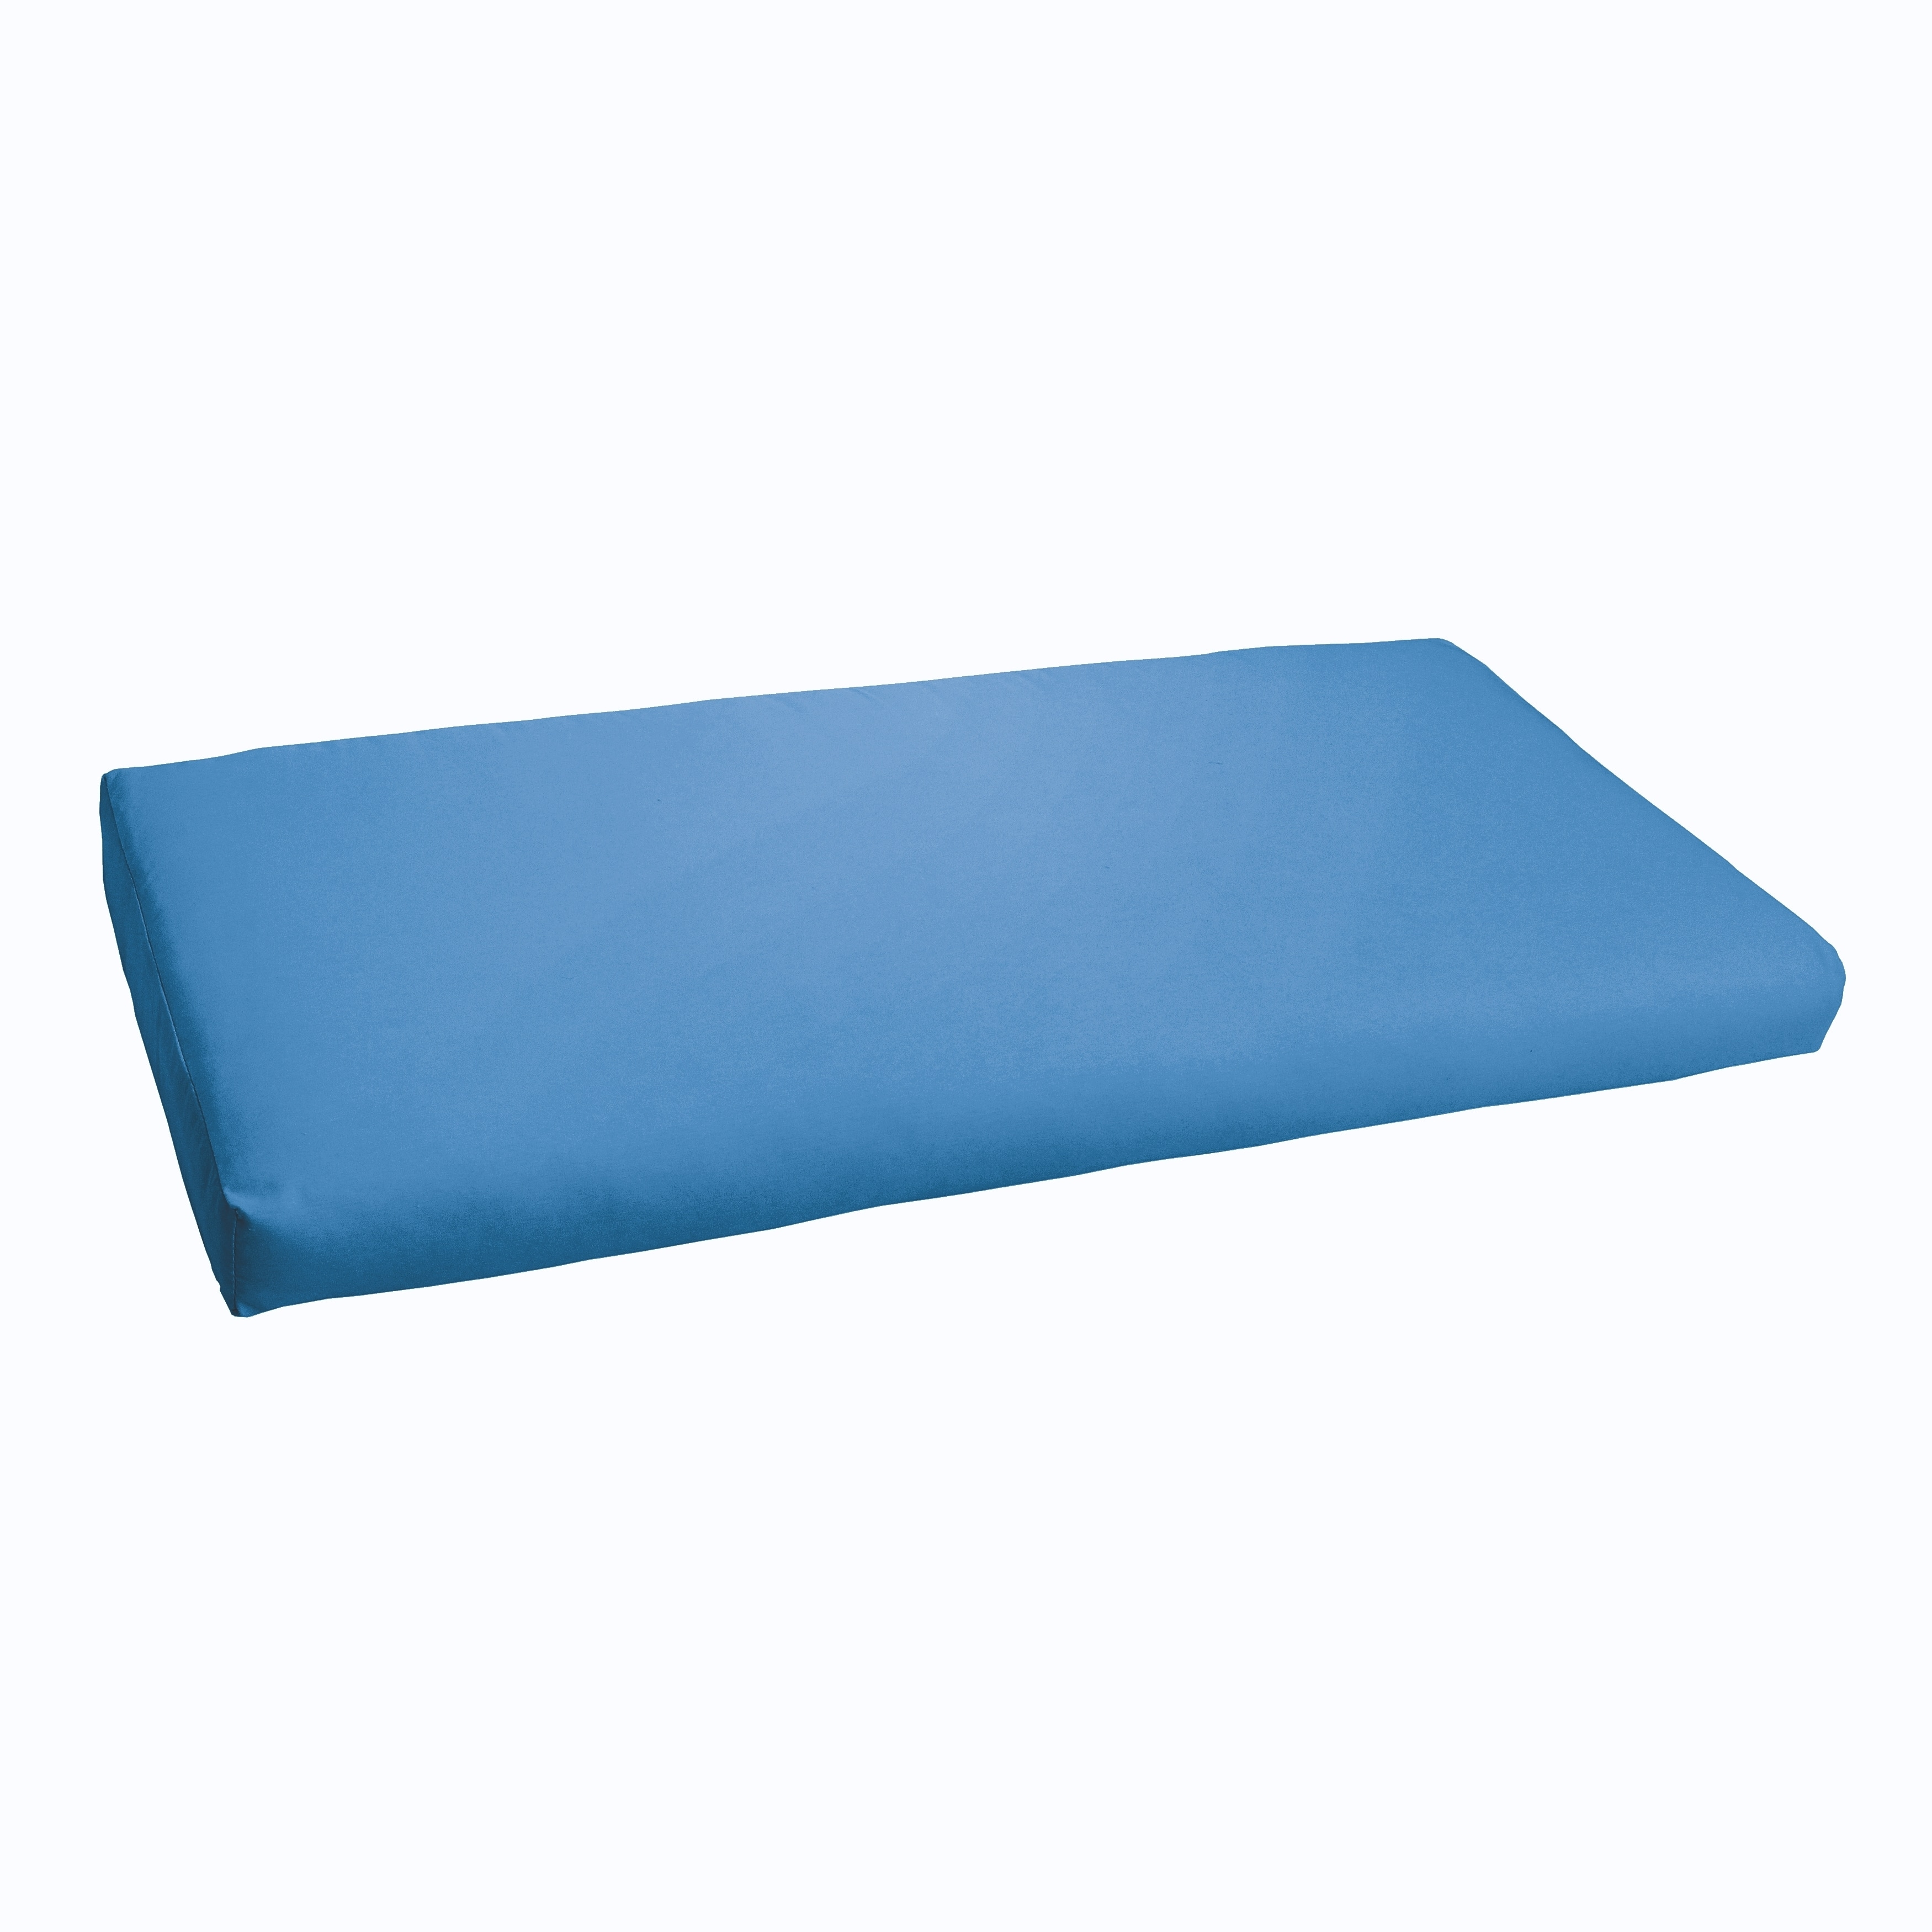 Sloane Light Blue 60 Inch Indoor Outdoor Bristol Bench Cushion